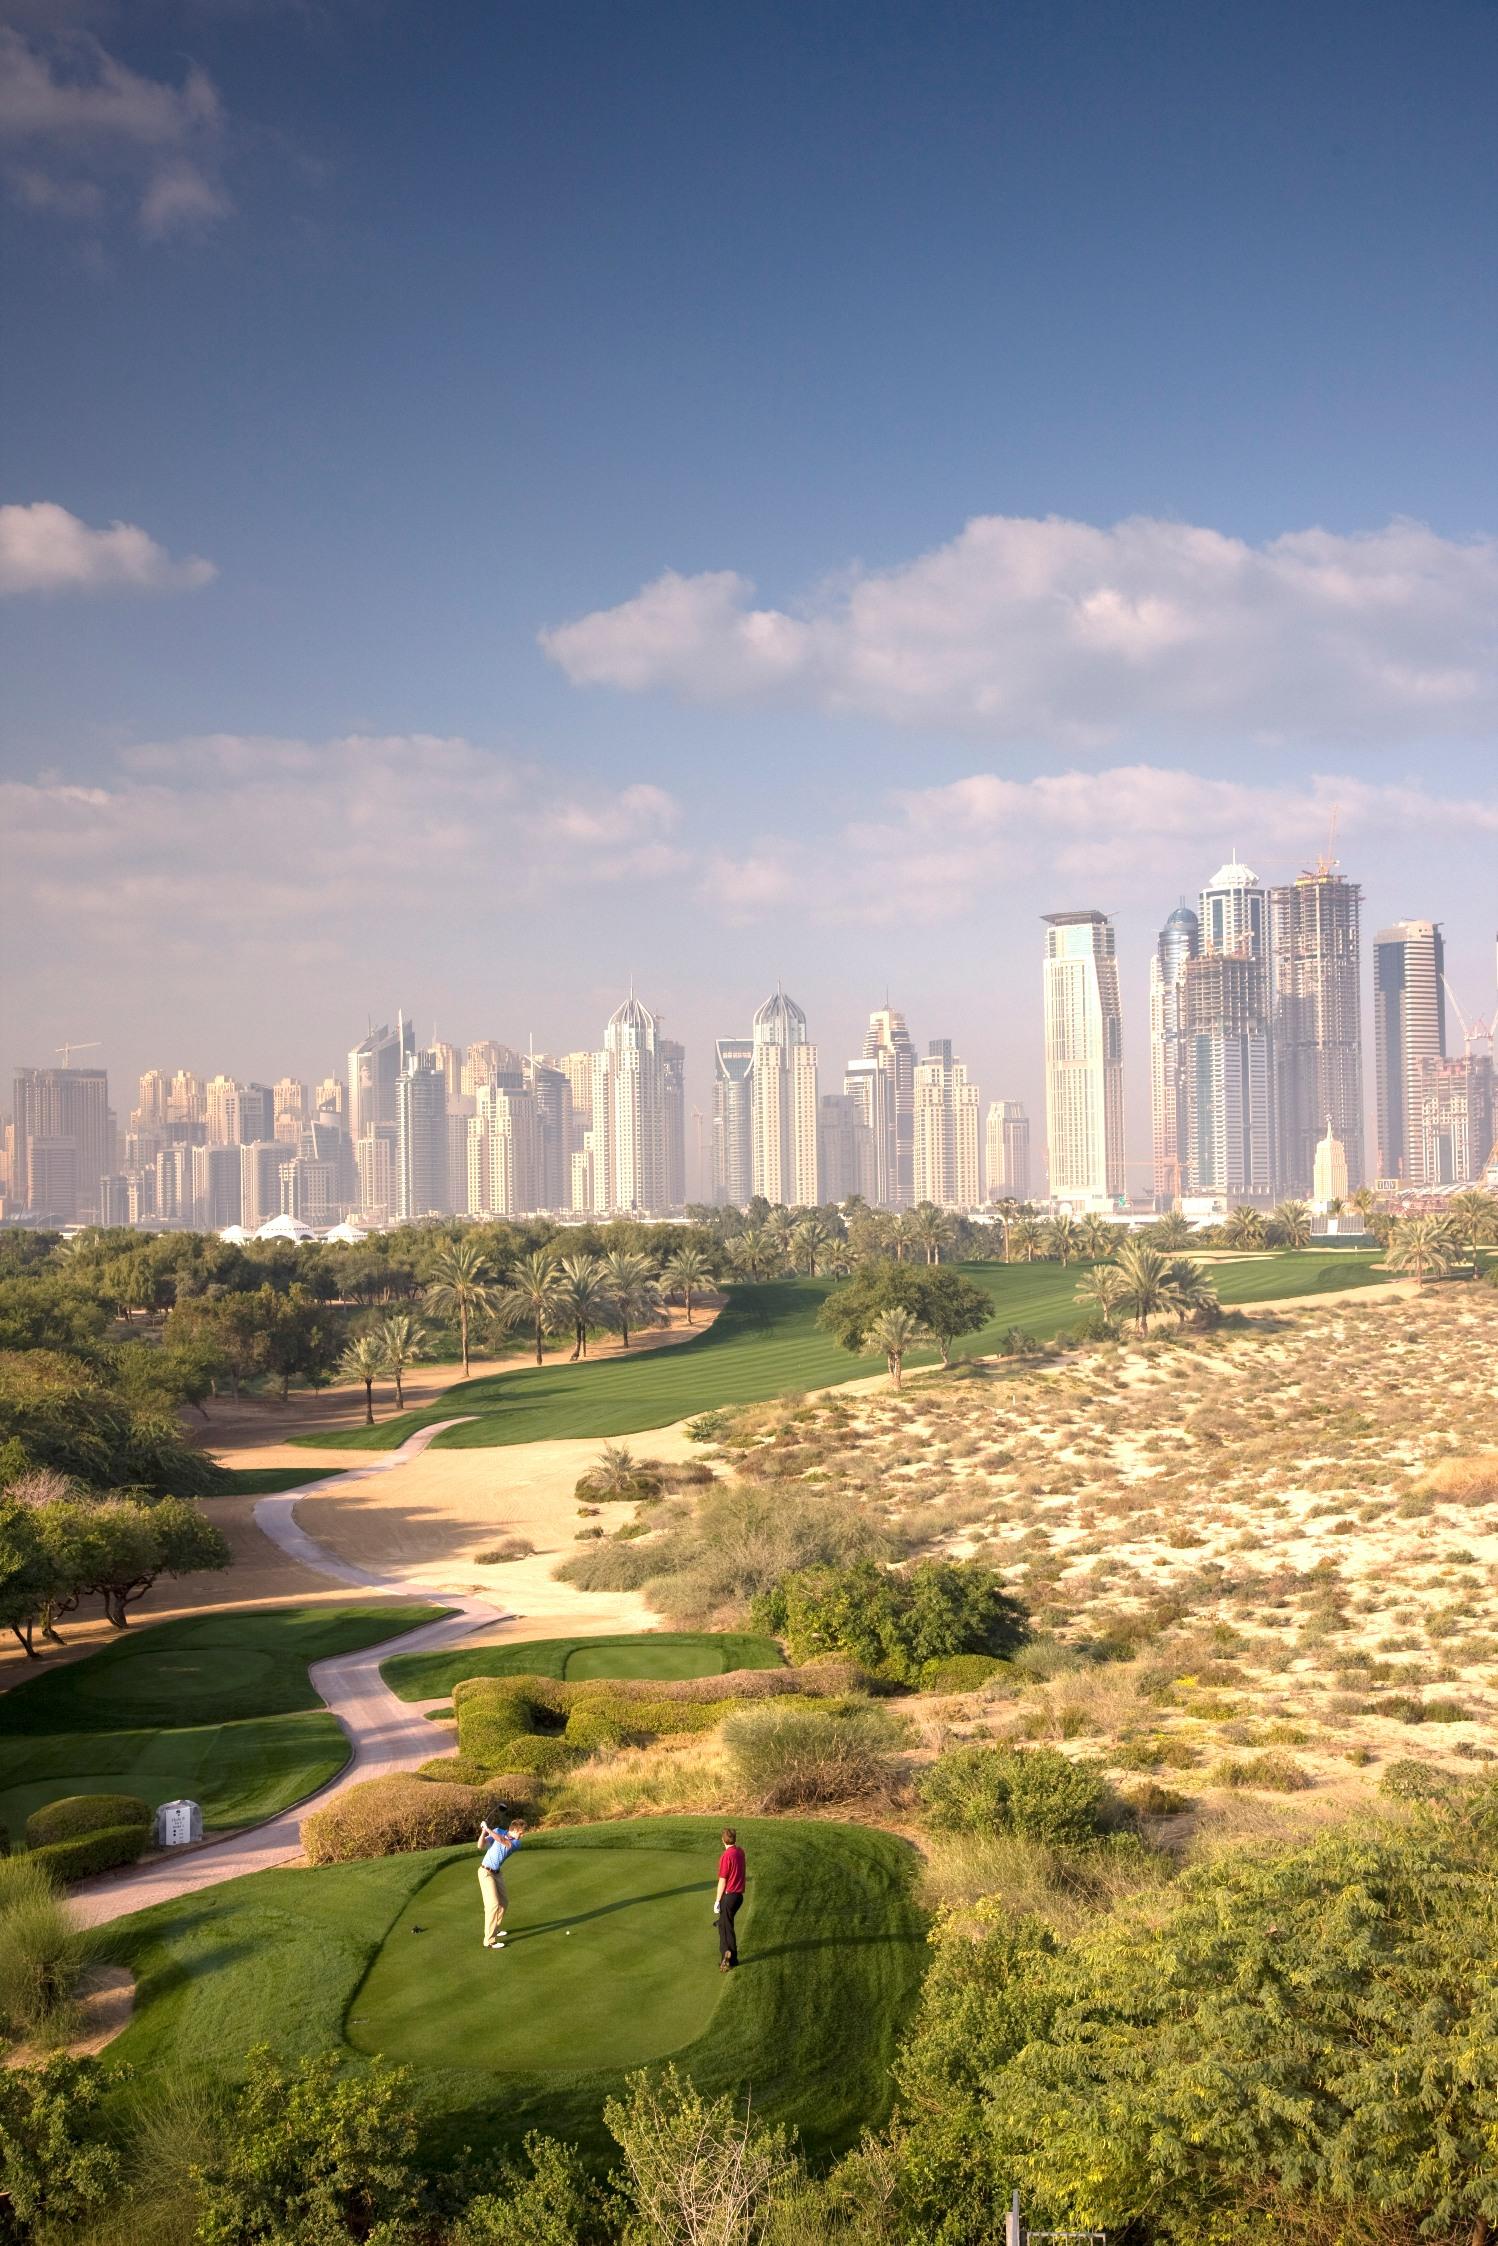 Emirates Golf Club 25th anniversary